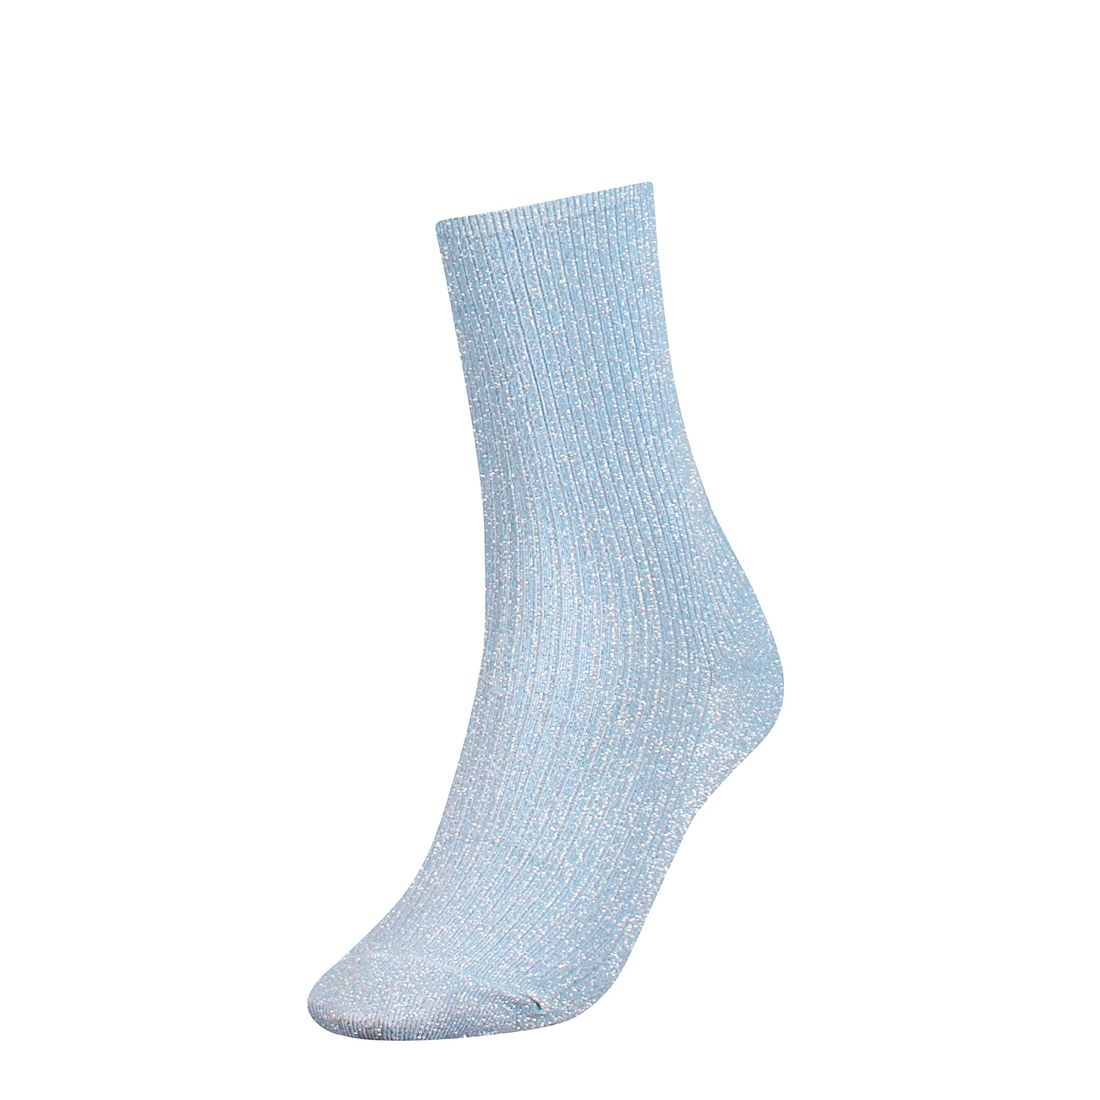 Afbeelding van Sale: Tommy Hilfiger sokken dames glitter blauw